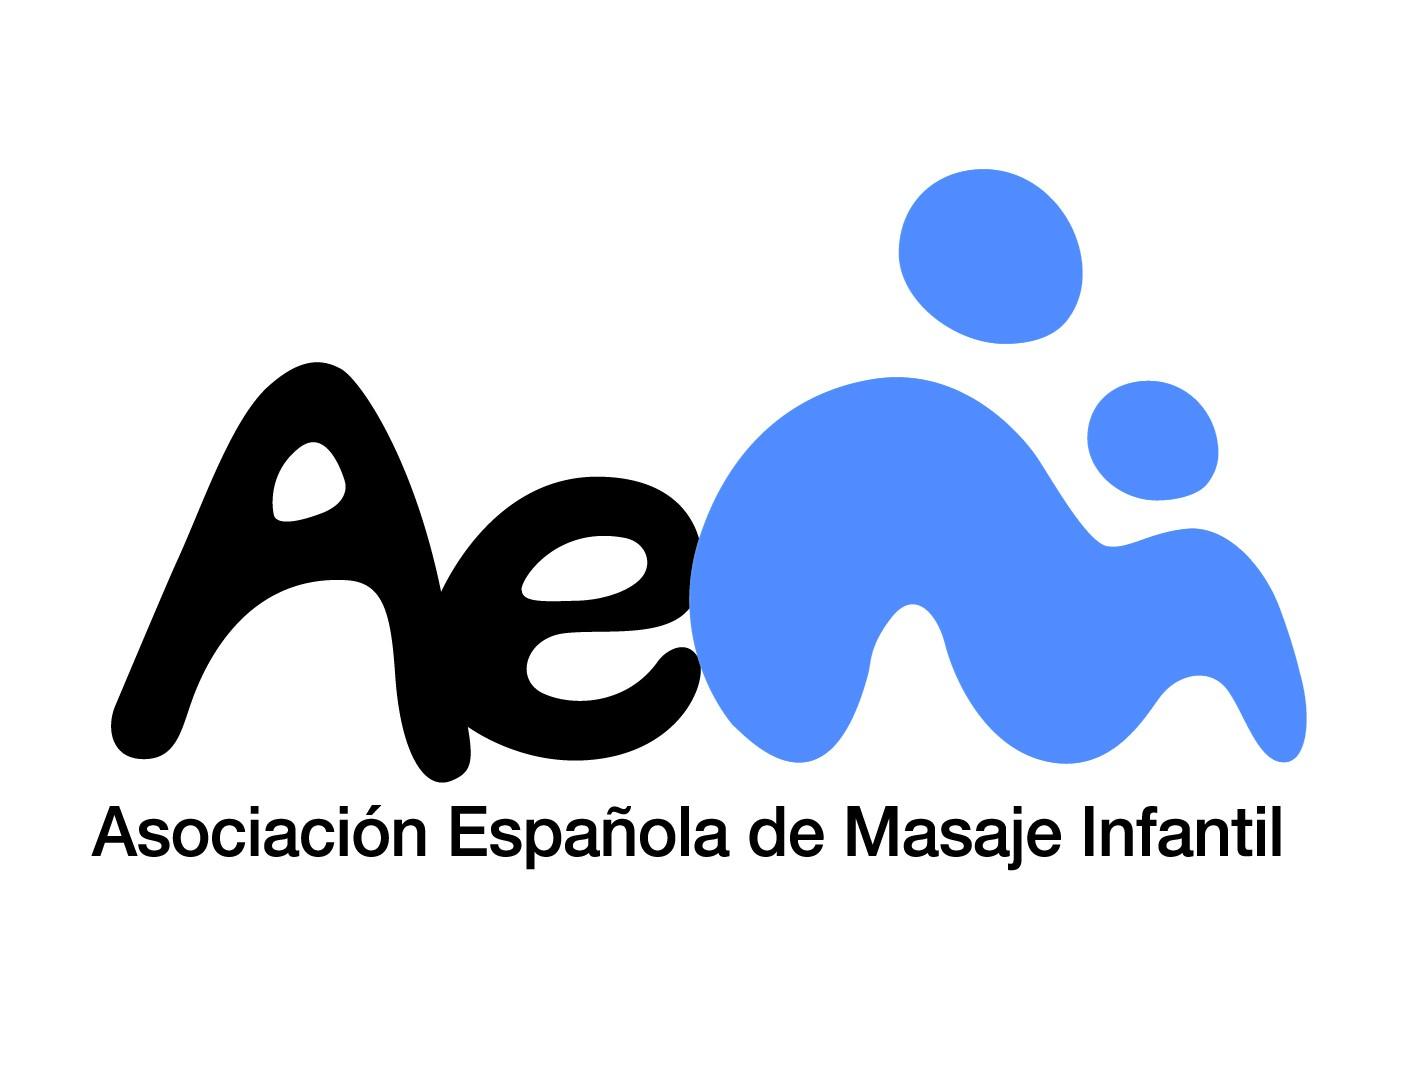 TALLER DE MASAJE INFANTIL DE AEMI